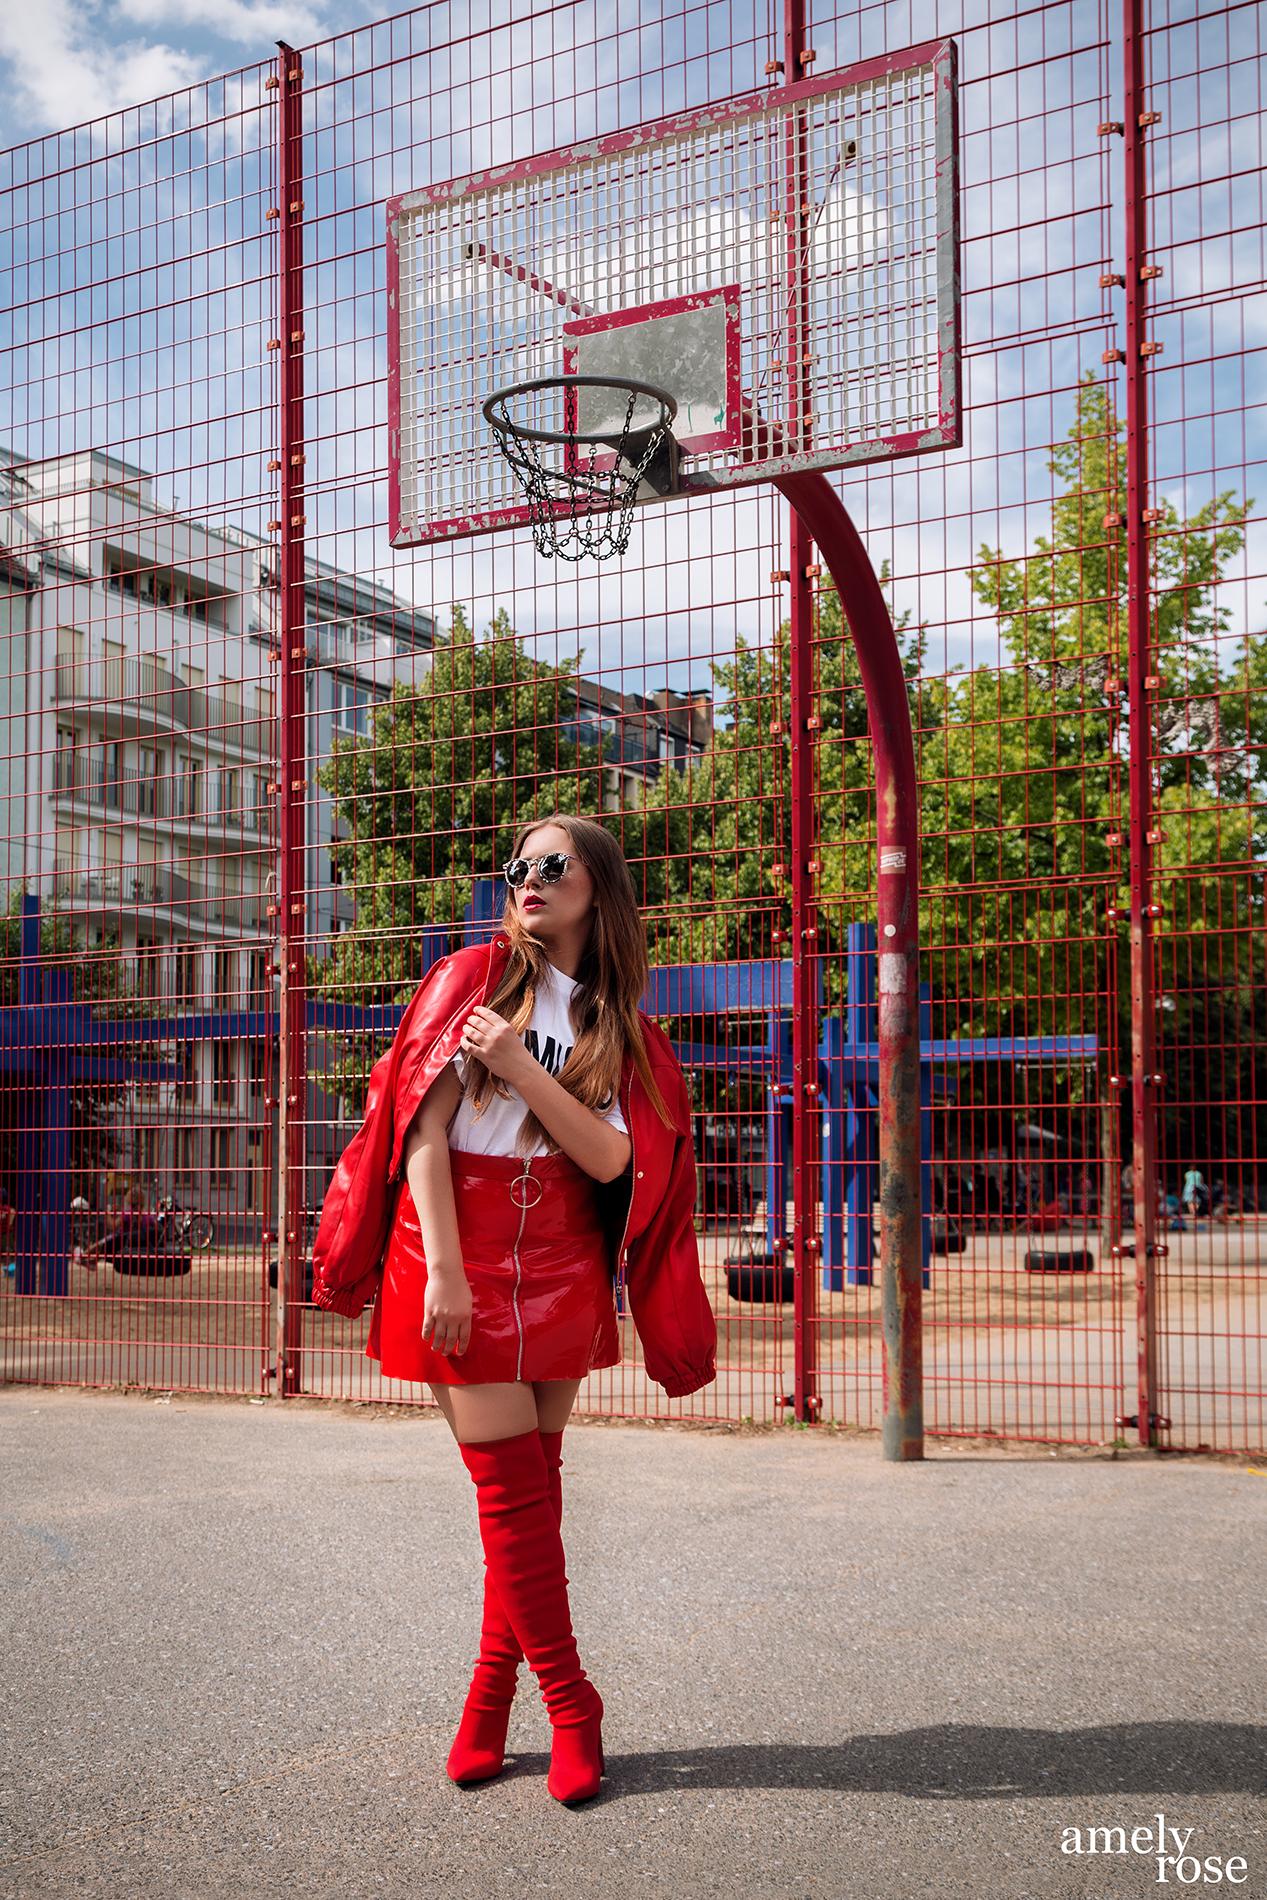 amelyrose, amely rose, amely-rose, fashionblogger, feministin, feminism, metoo, #metoo, düsseldorf, sportplatz, lackrock, rot, lady in red, statement shirt